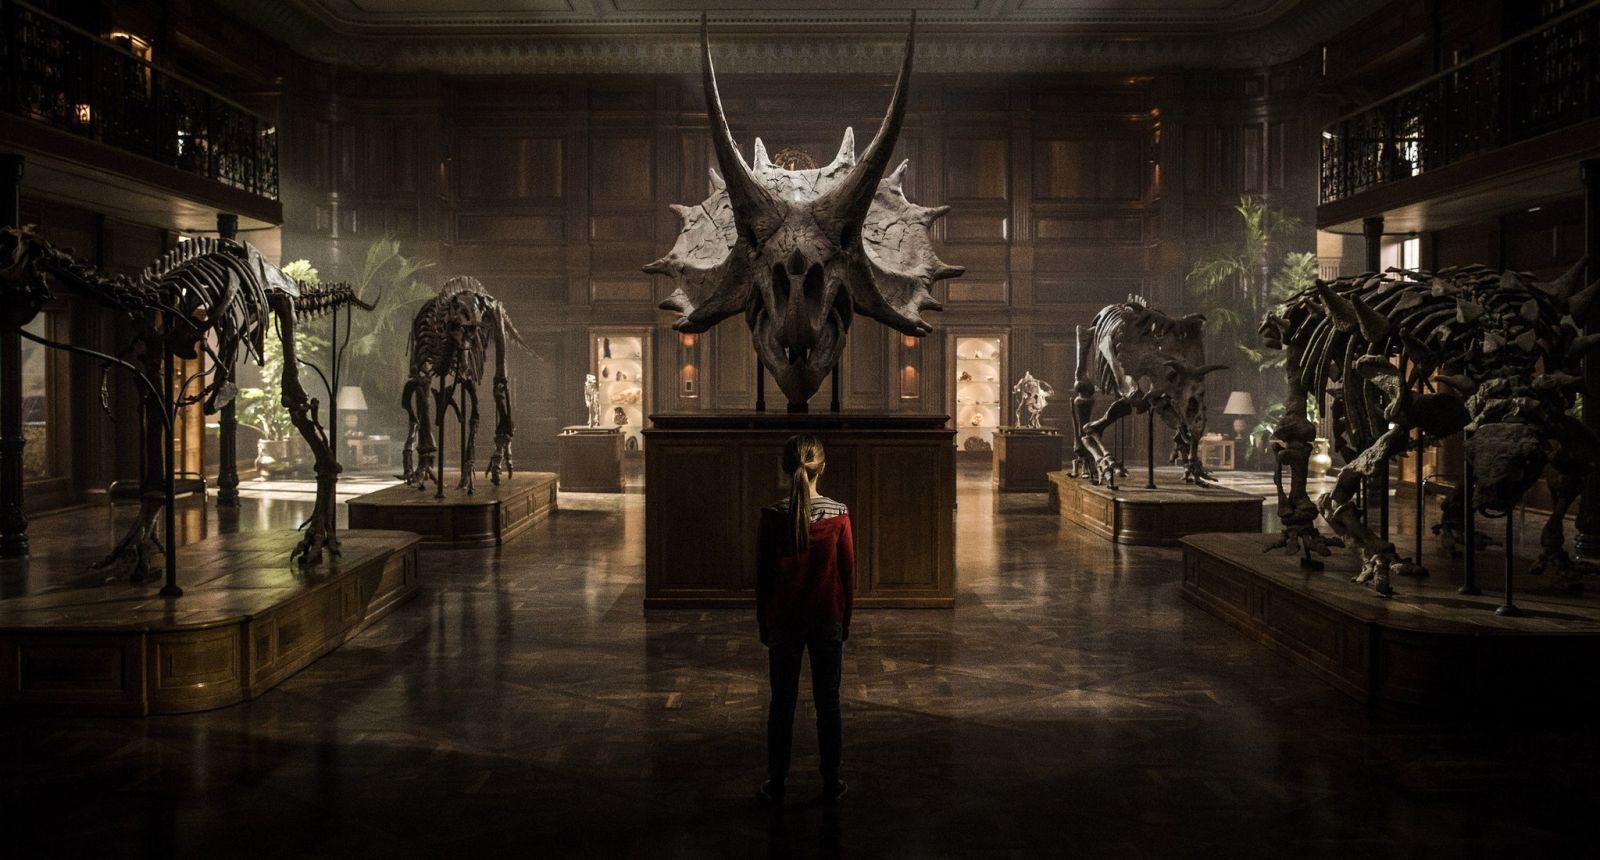 Imagen 4 de Jurassic World: El Reino Caído